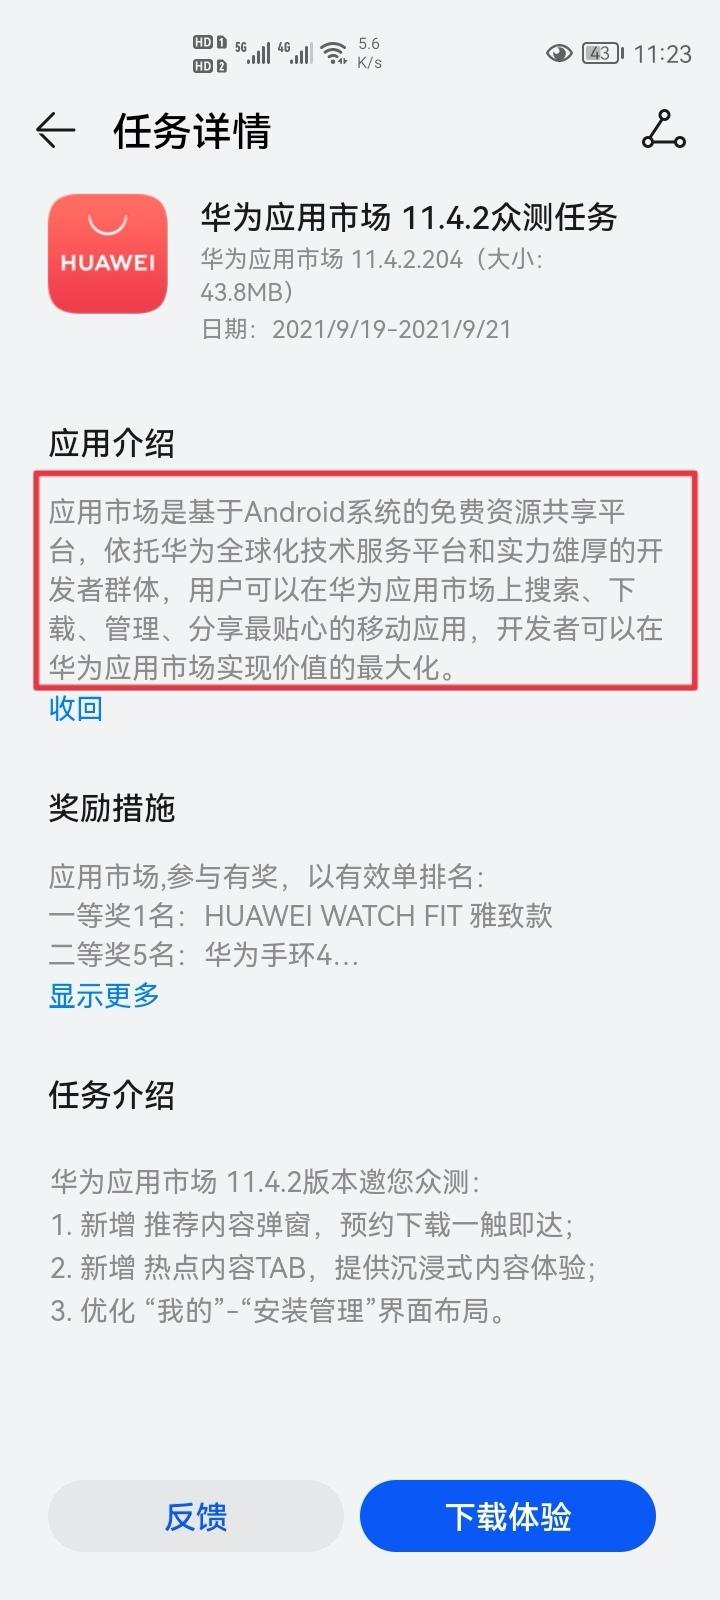 Screenshot_20210920_232308_com.huawei.mycenter_edit_503292955237265.jpg